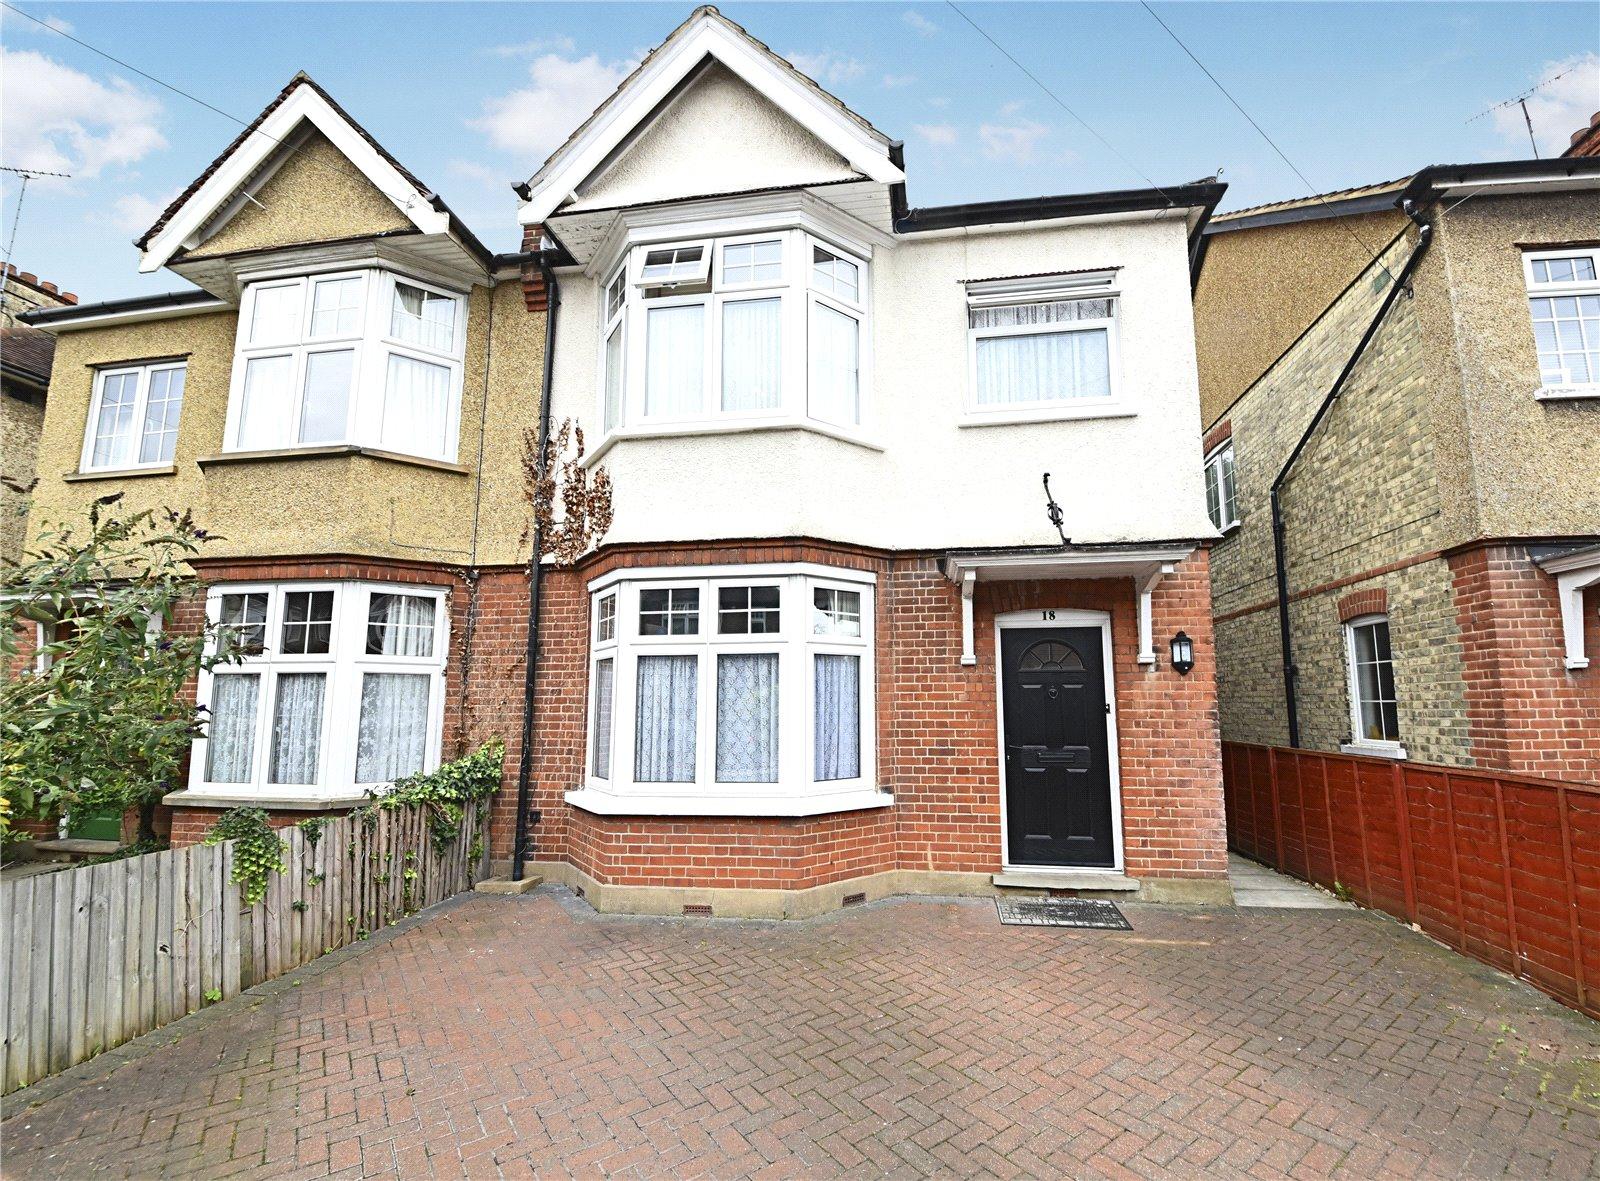 4 bed house for sale in New Barnet, EN5 5HT 0